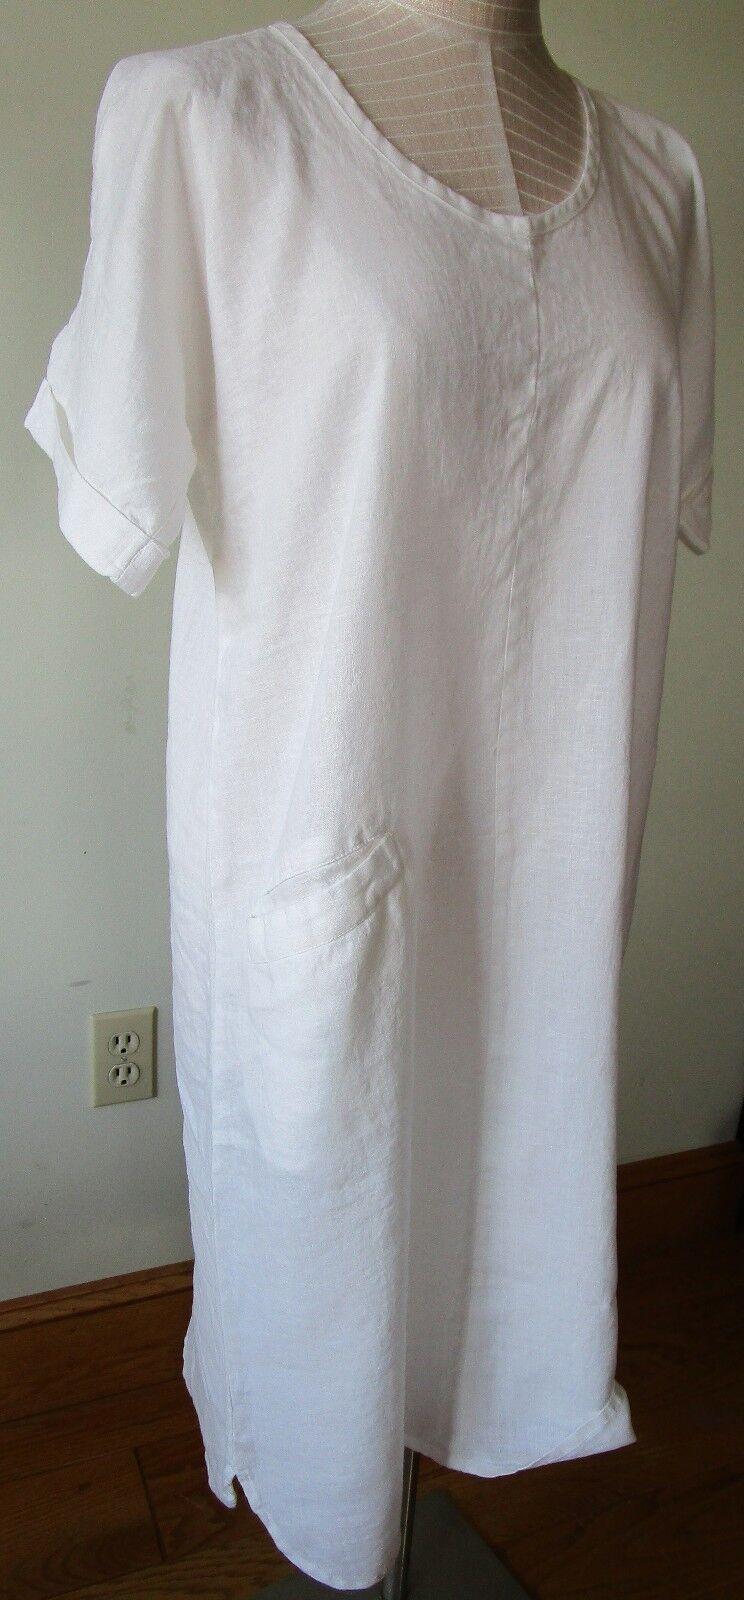 FLAX Designs  LINEN DRESS  S  &  M    NWT  Sage  Dress  2018 BOLD  WHITE